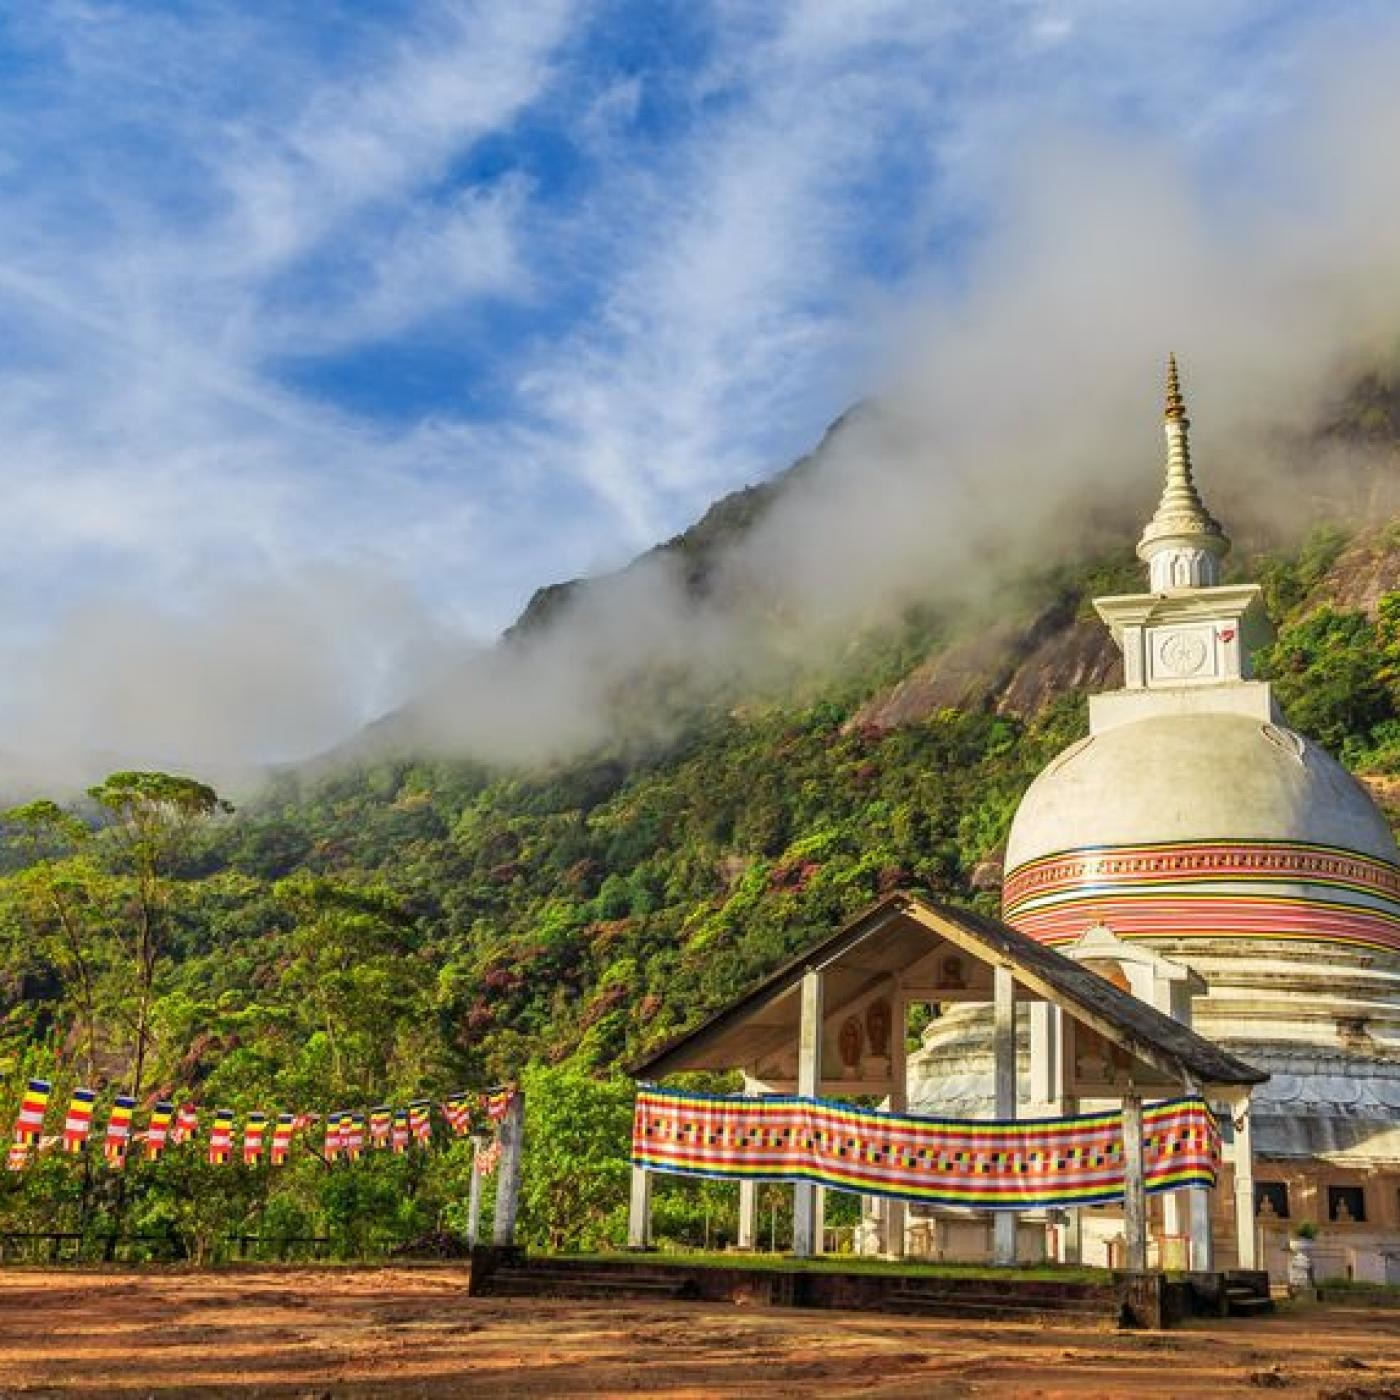 Clémence au Sri Lanka - 06 11 2020